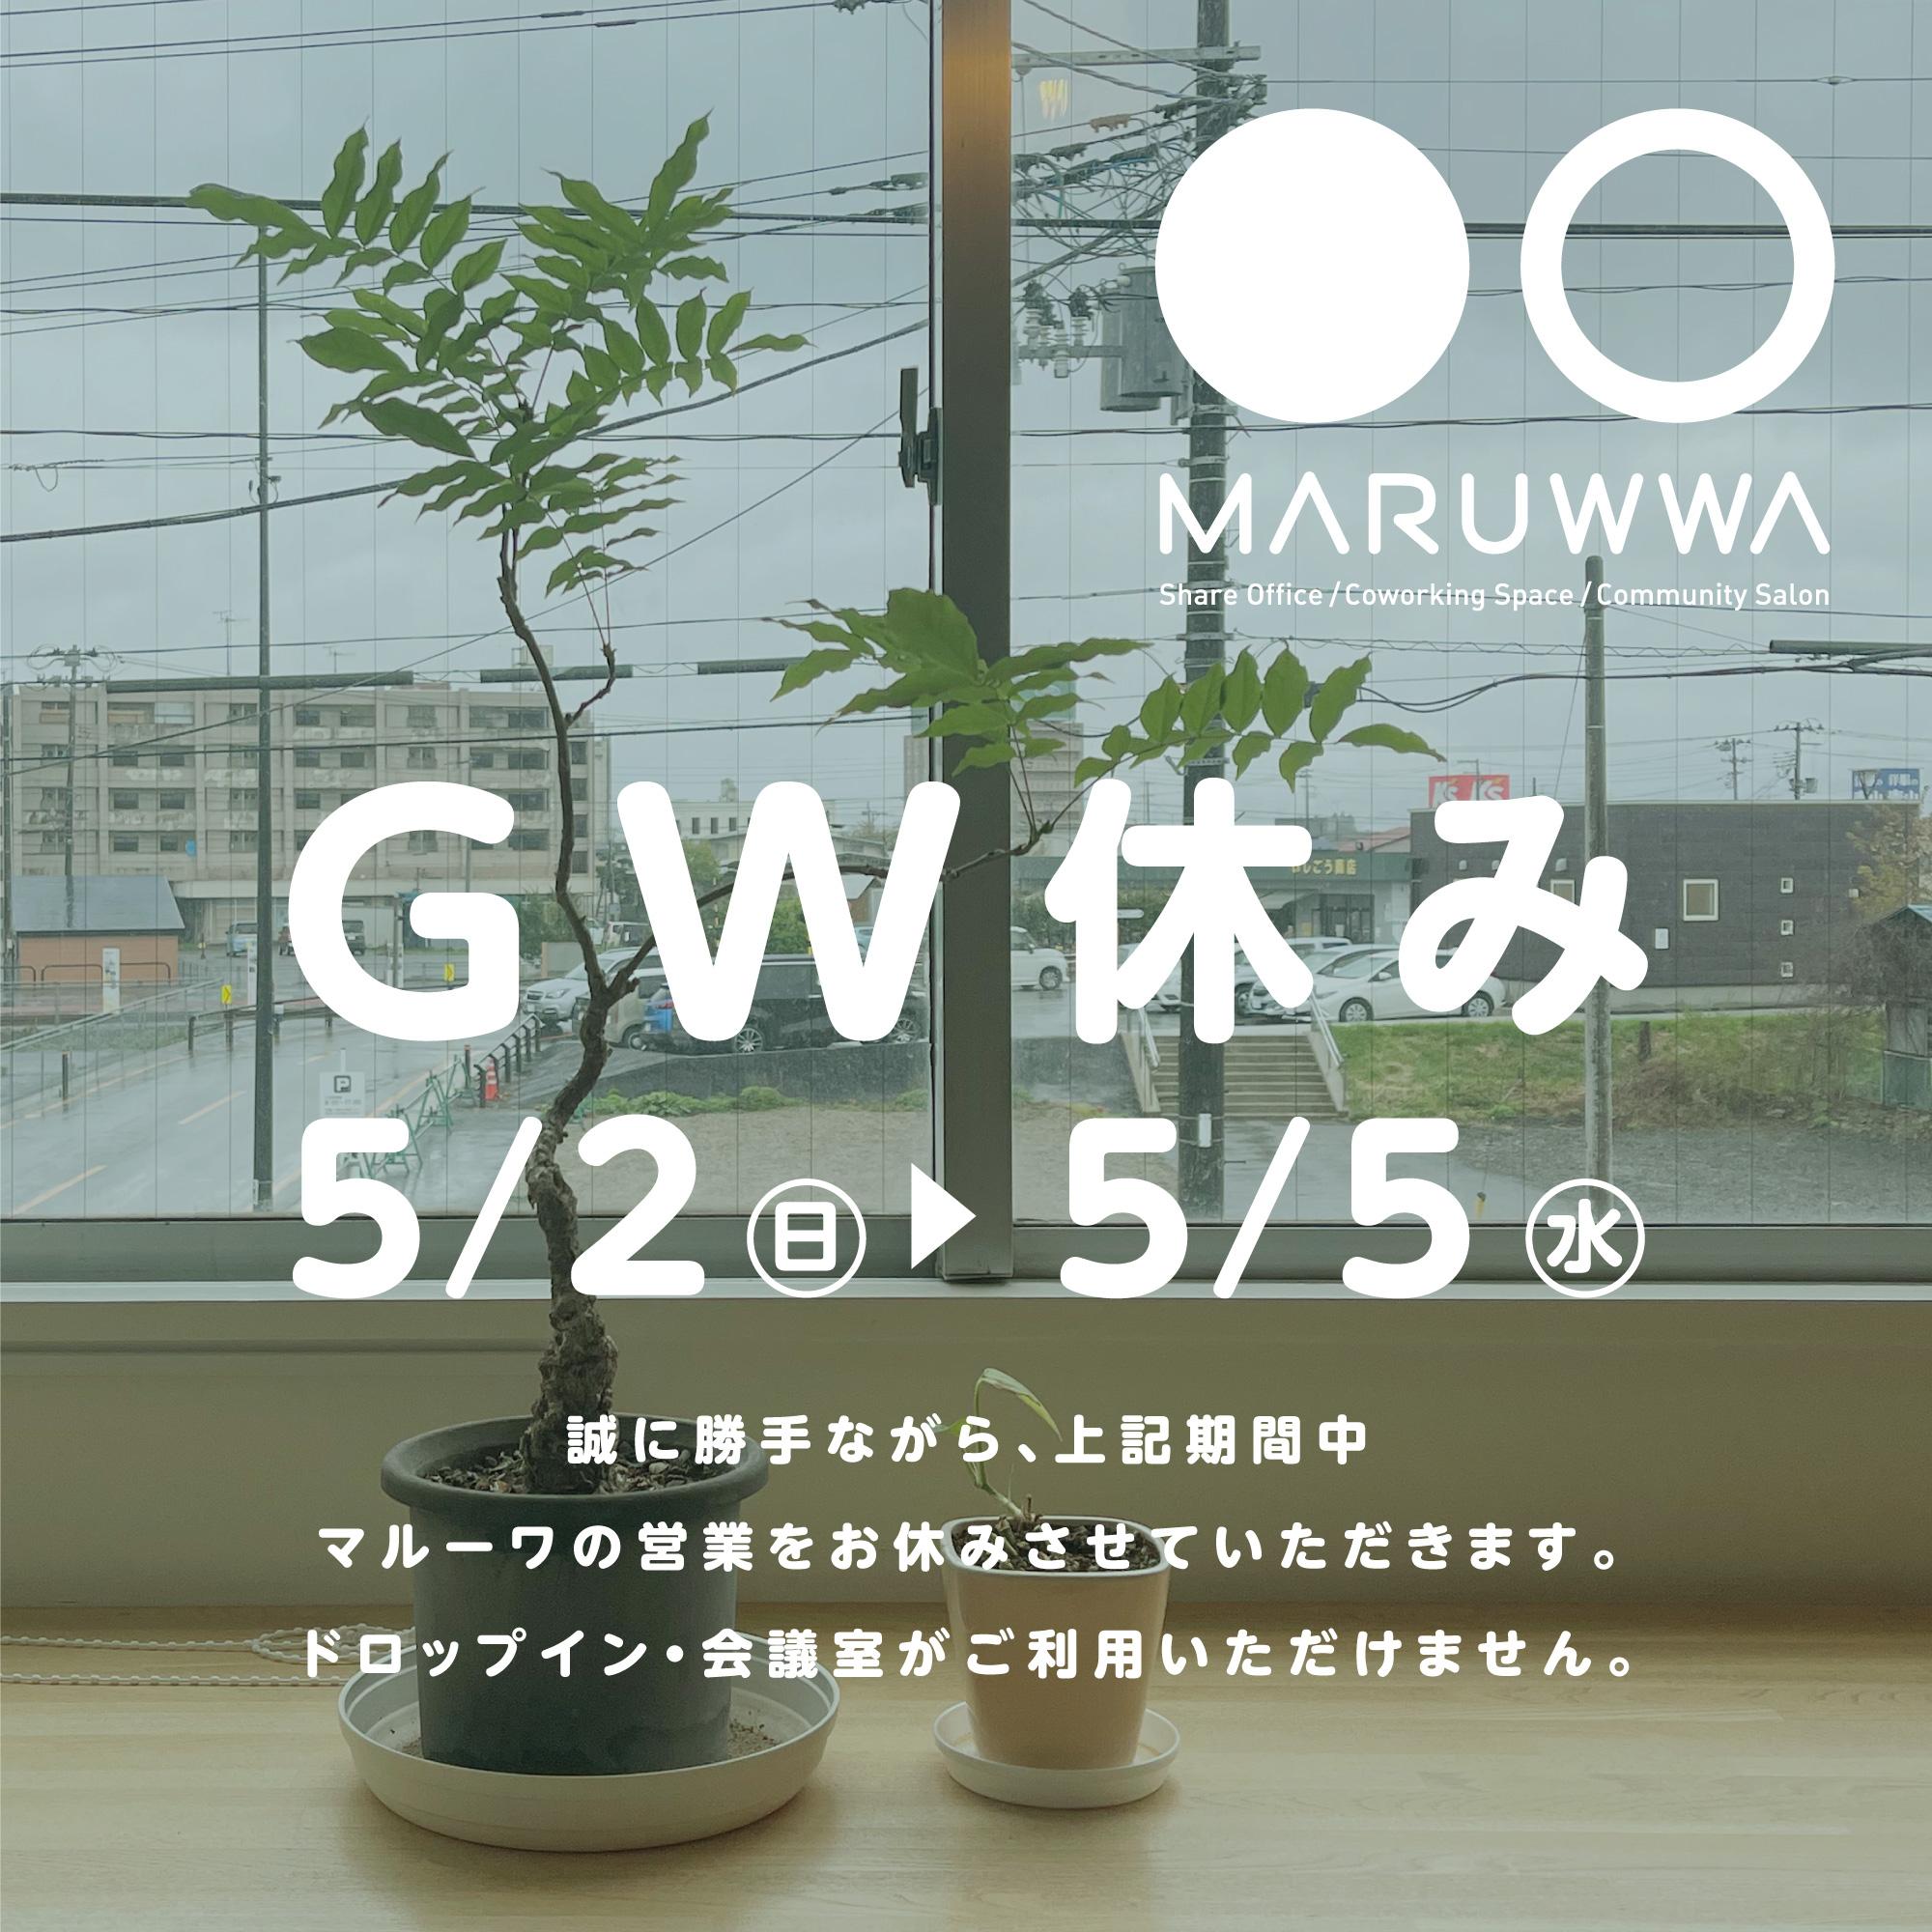 MARUWWAのGW休み